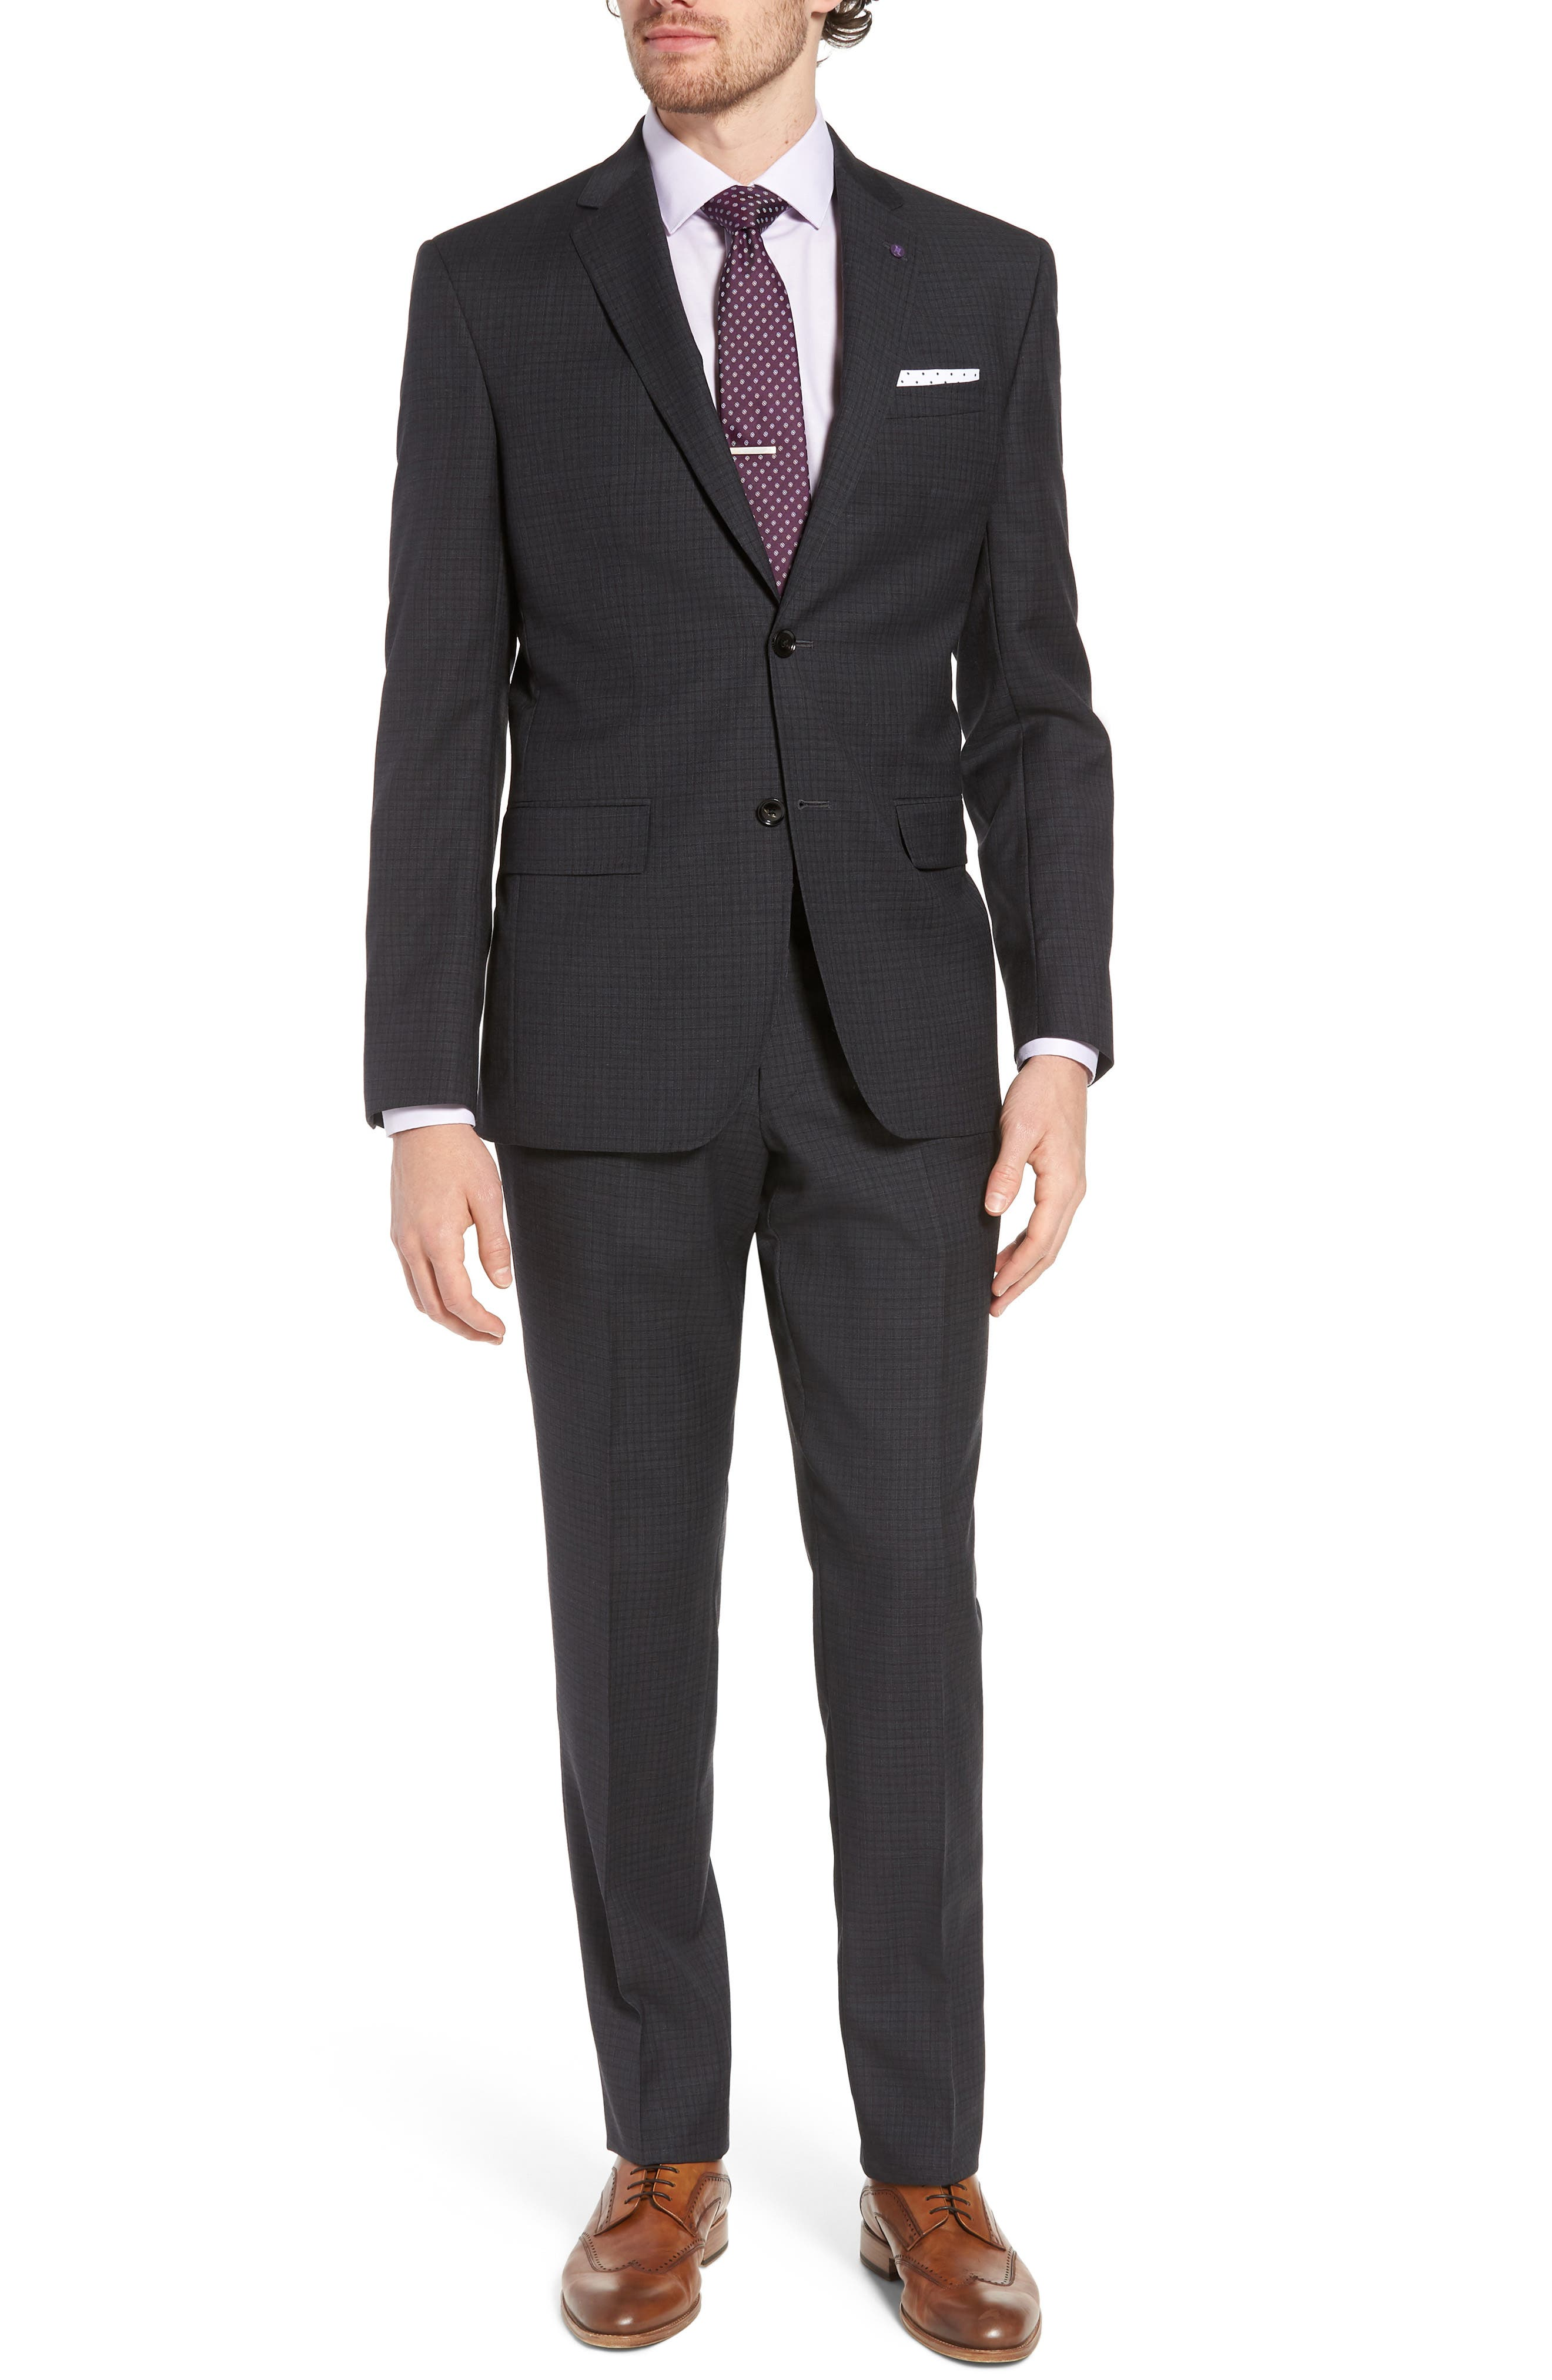 Jay Trim Fit Check Wool Suit,                             Main thumbnail 1, color,                             020